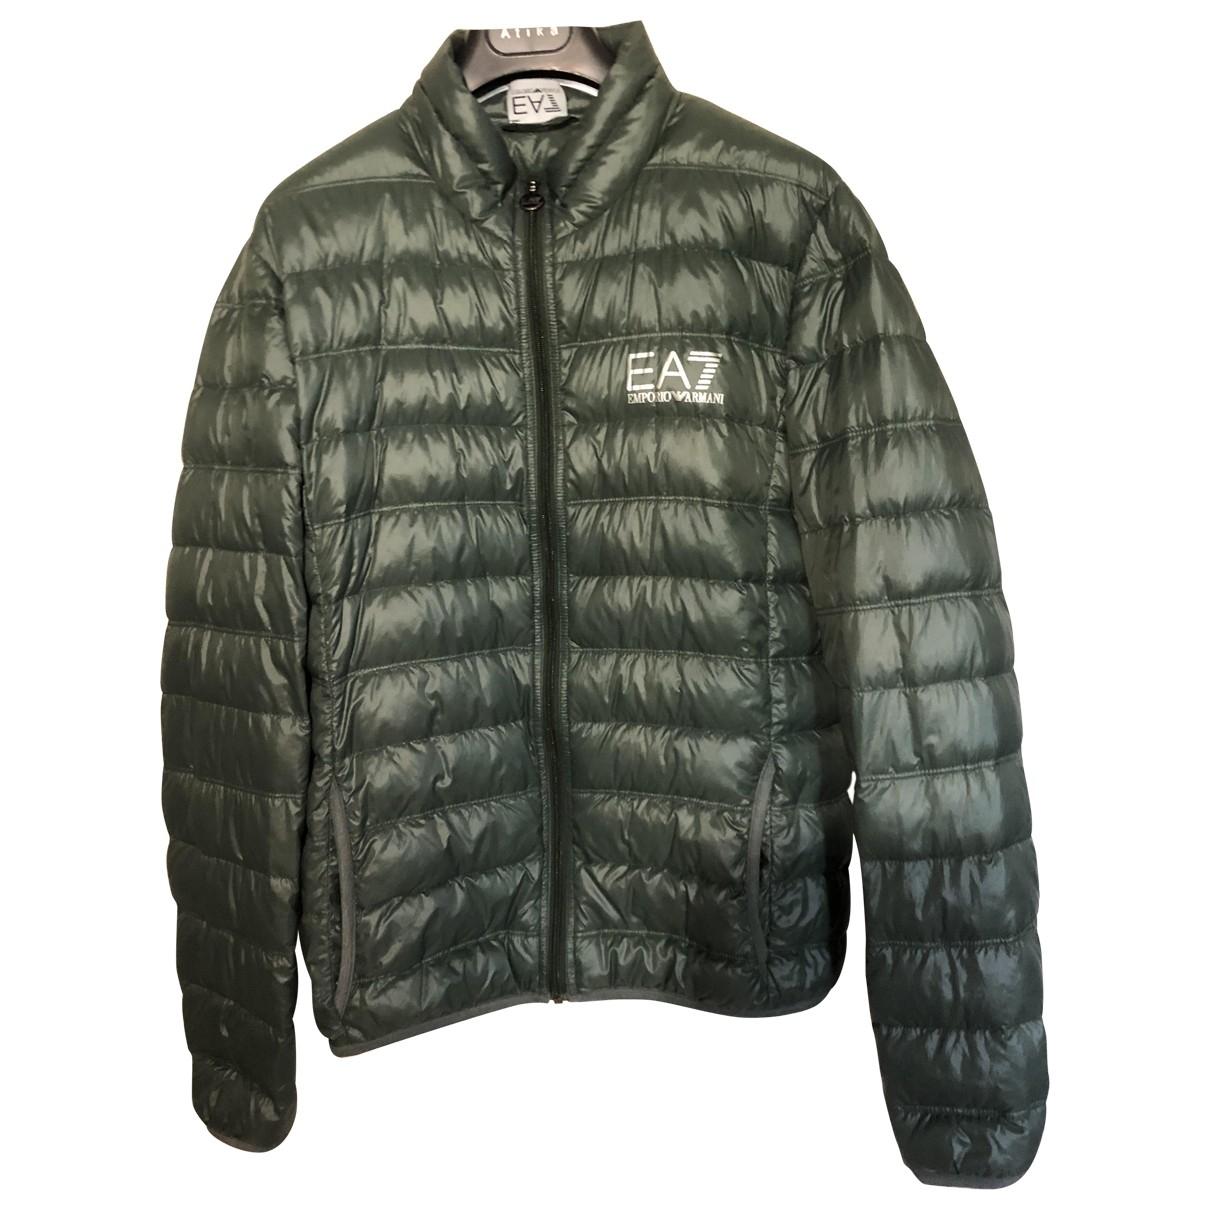 Emporio Armani \N Khaki coat  for Men M International